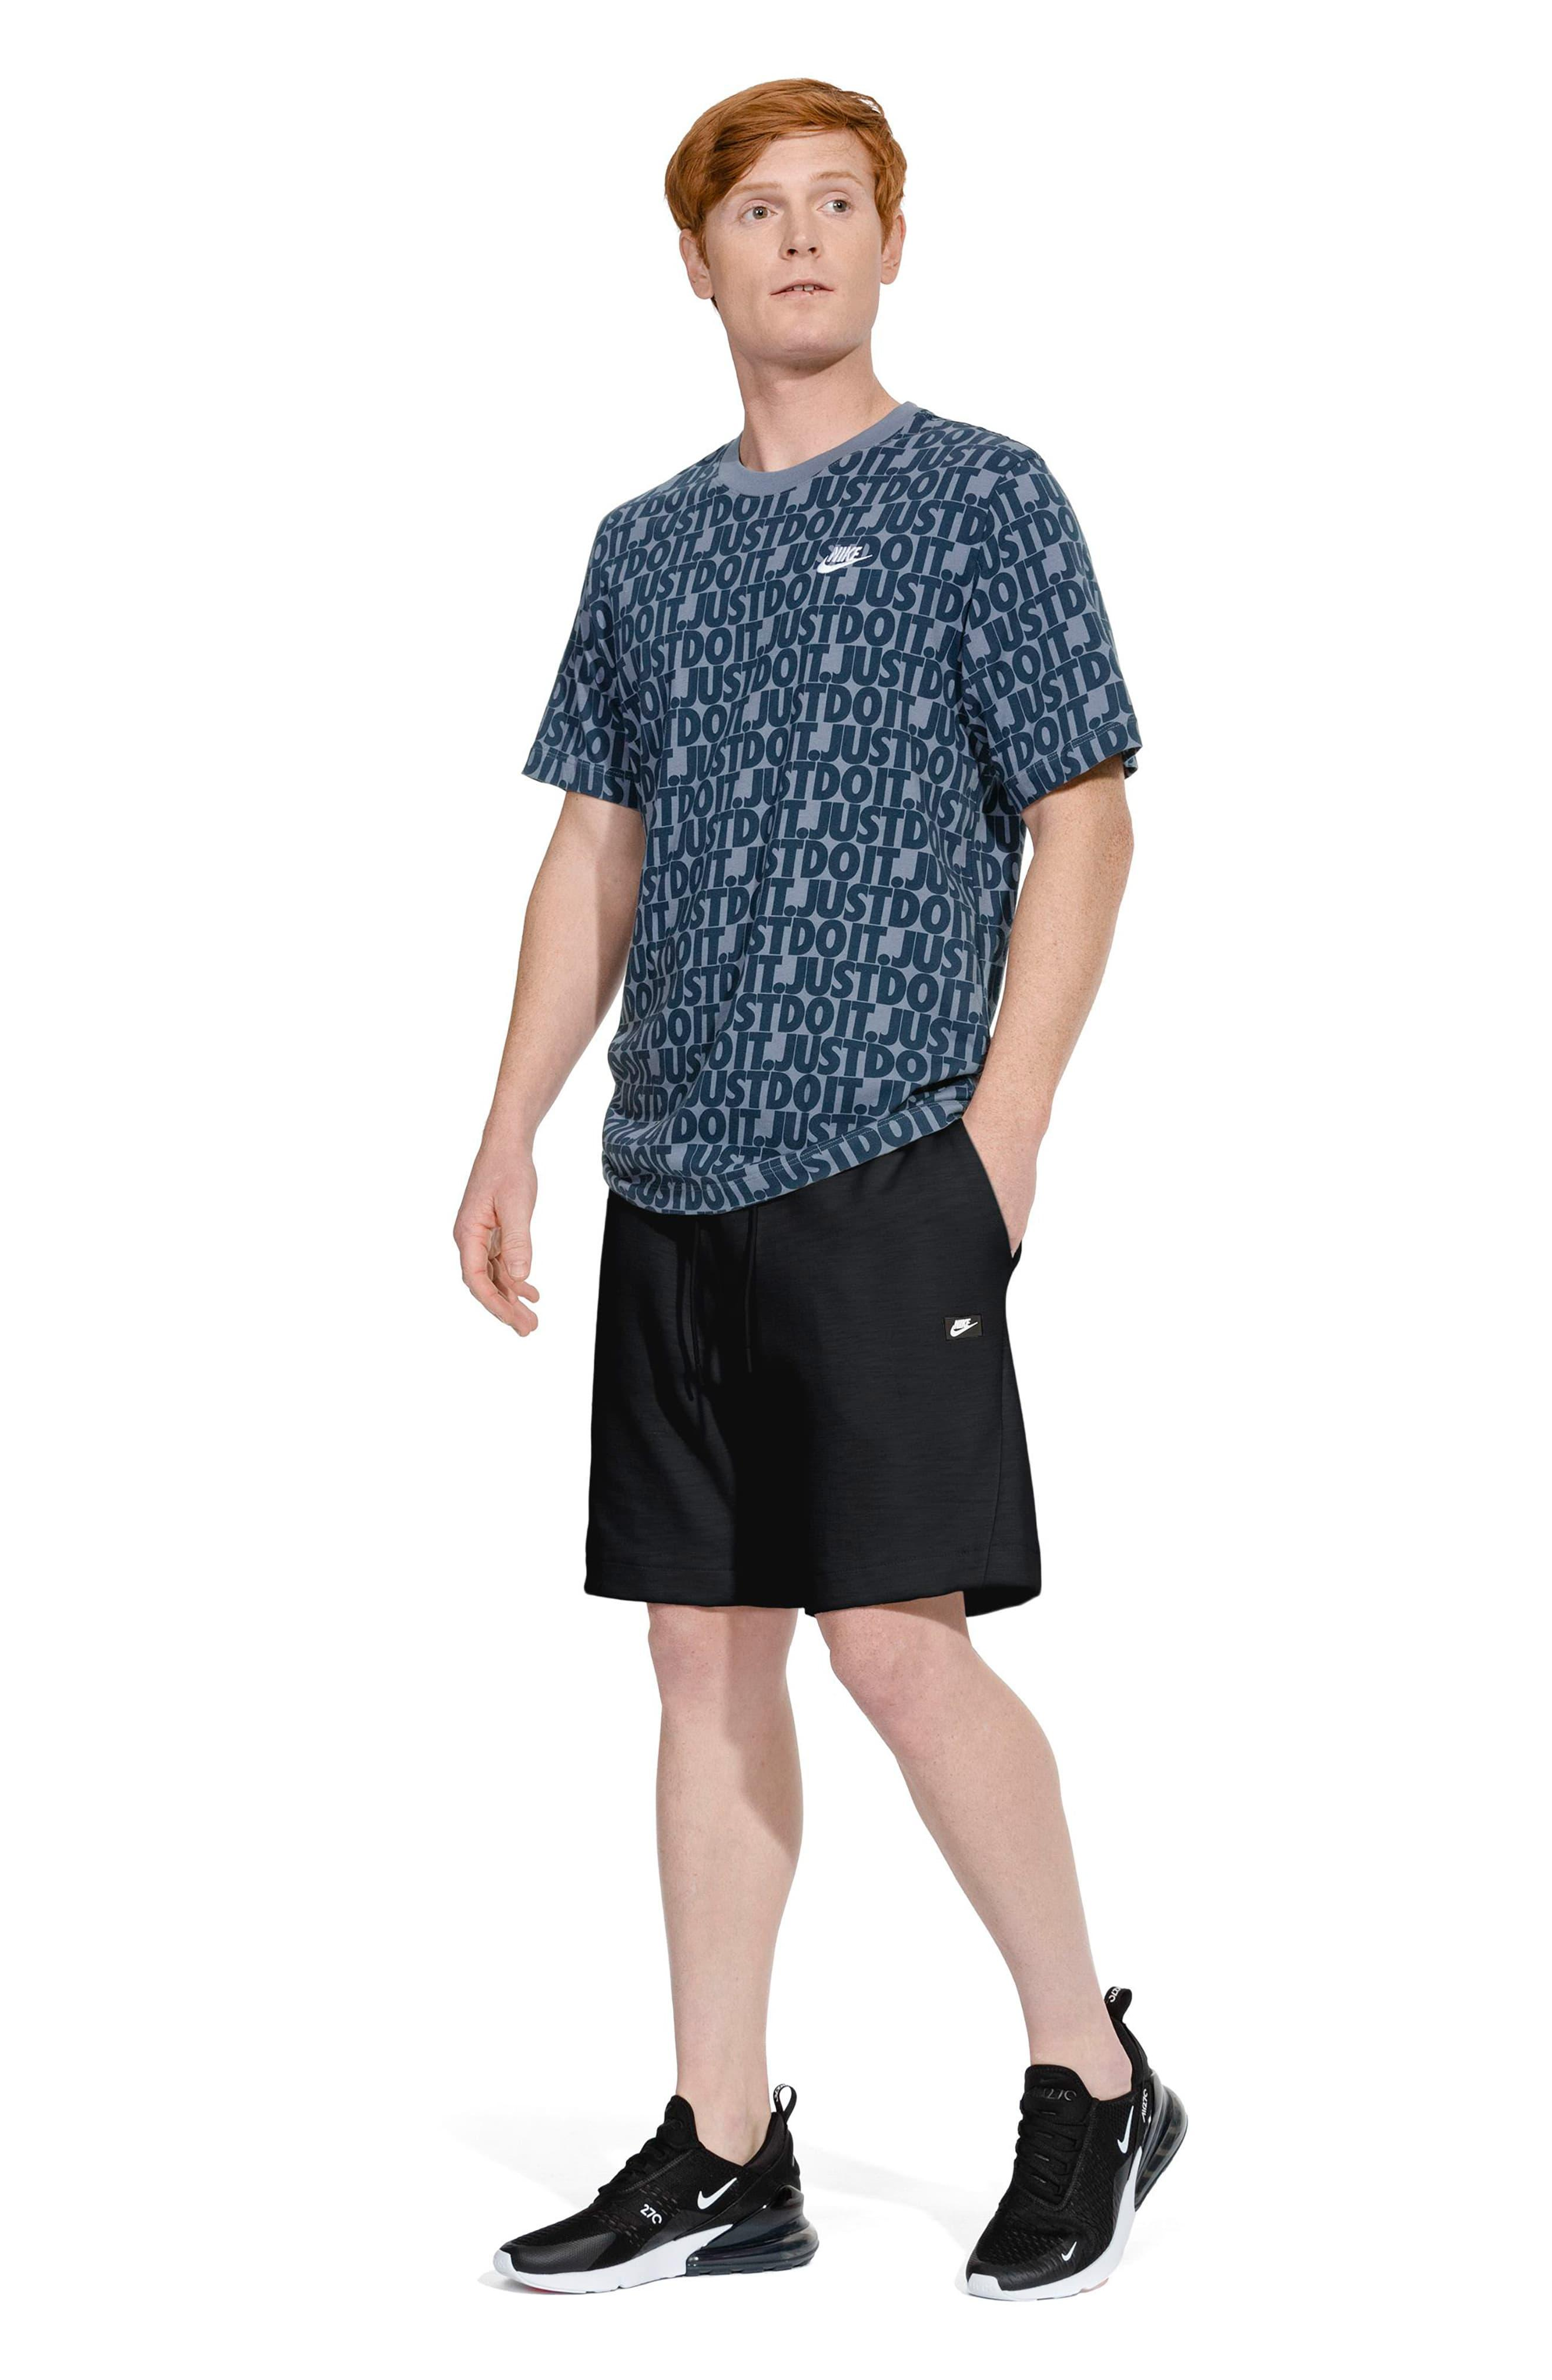 air max 270 with shorts